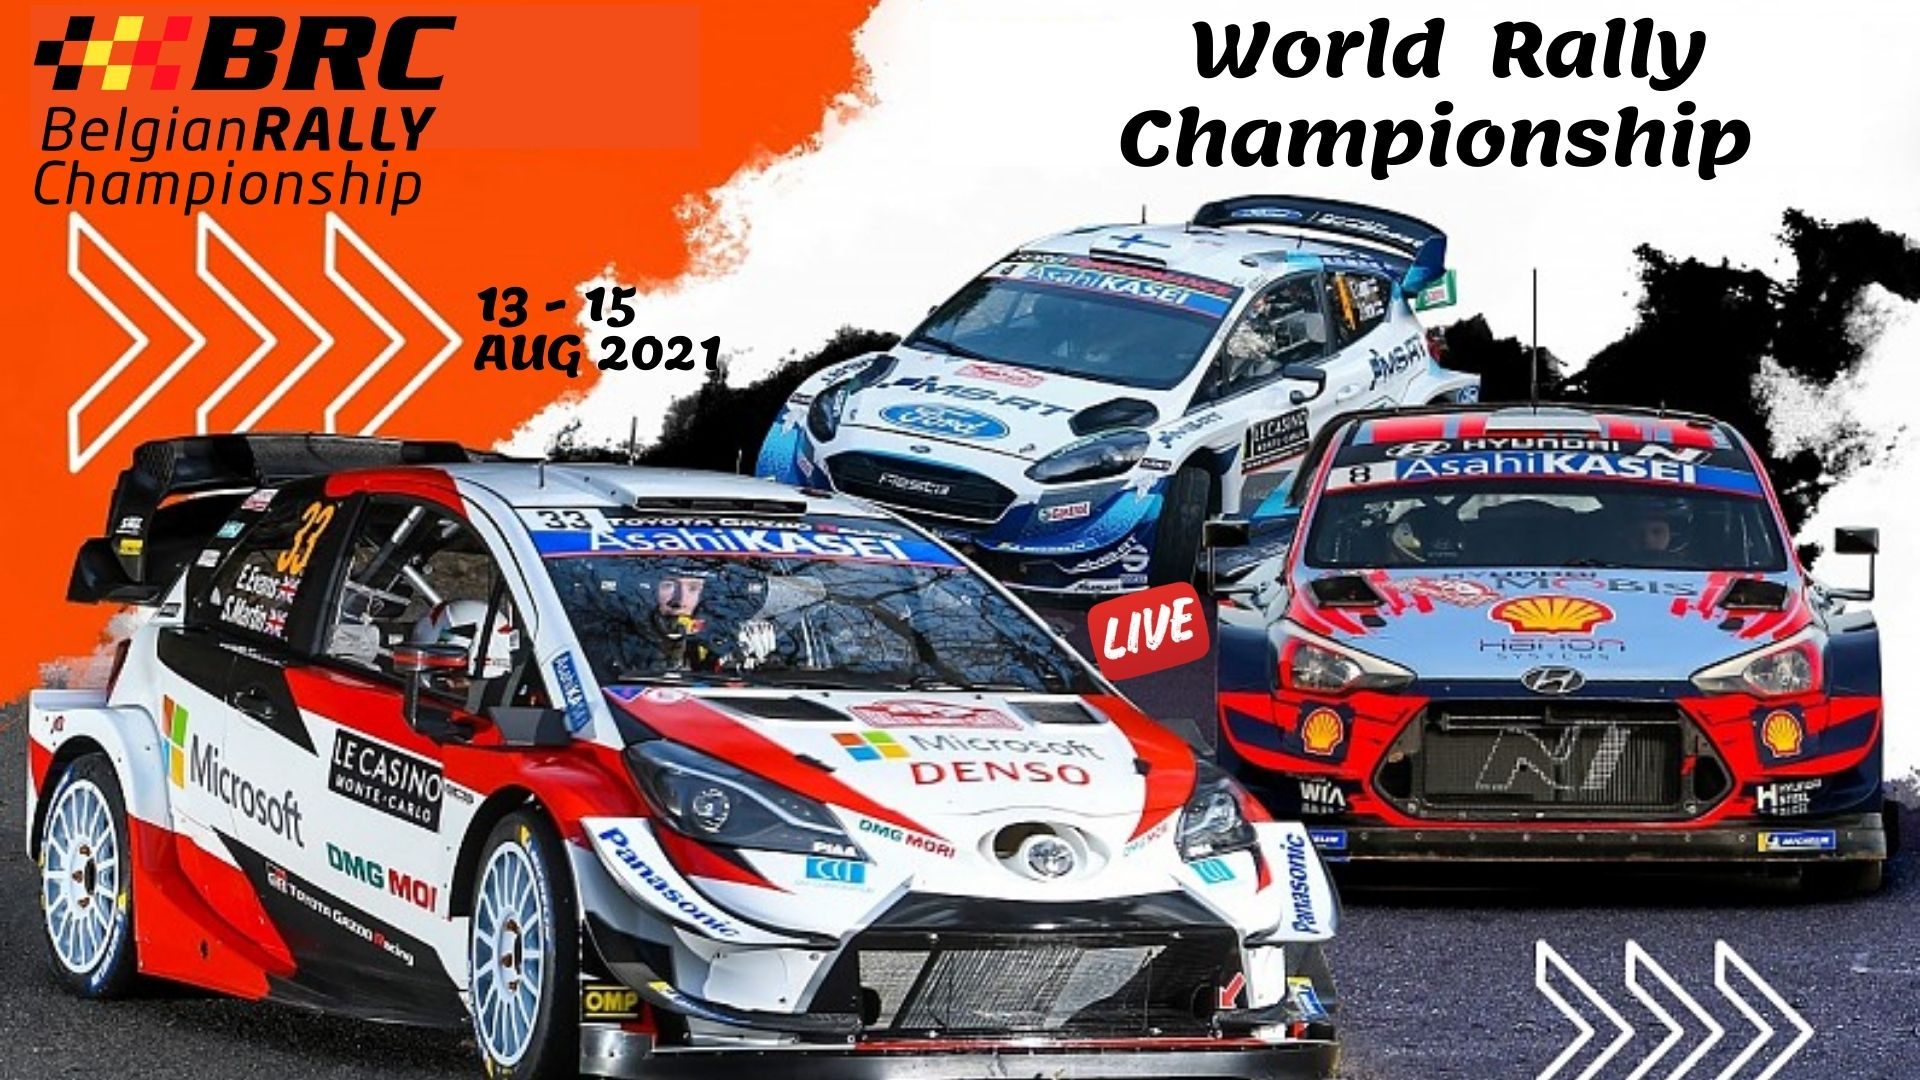 WRC Belgium Rally Live Stream 2021